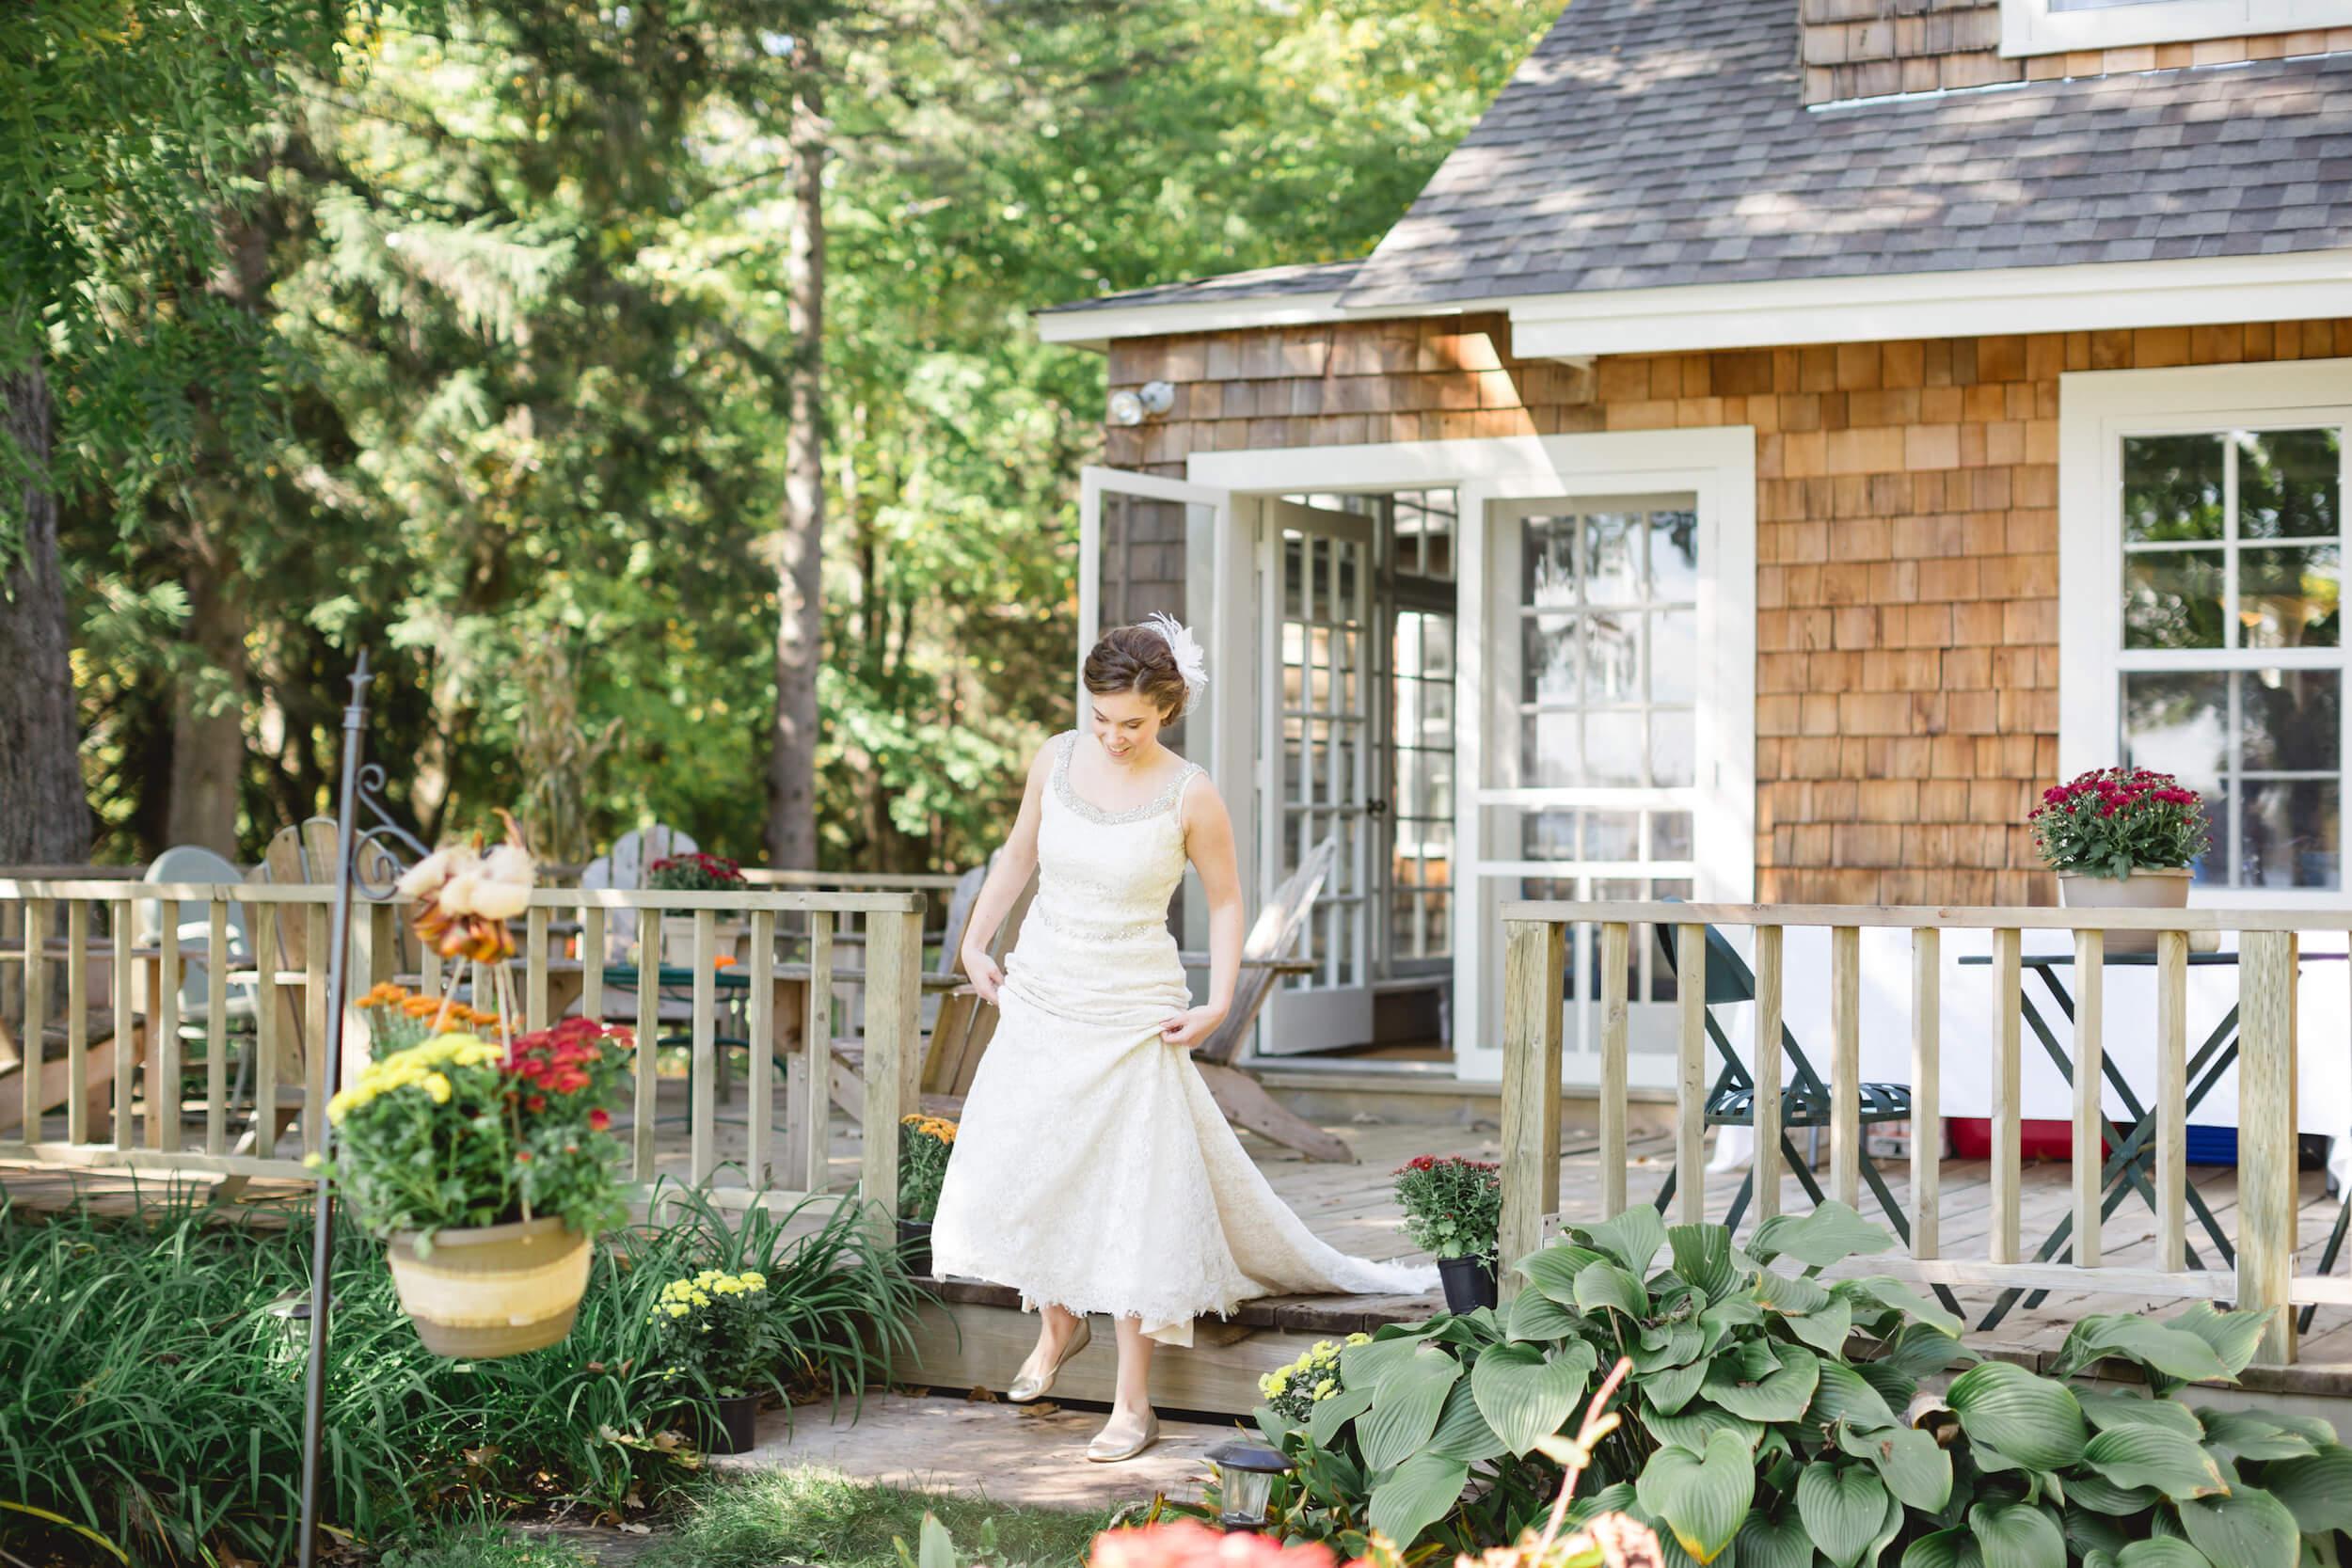 rochelle-louise-photography-acowsay-cinema-wisconsin-wedding-25.jpg